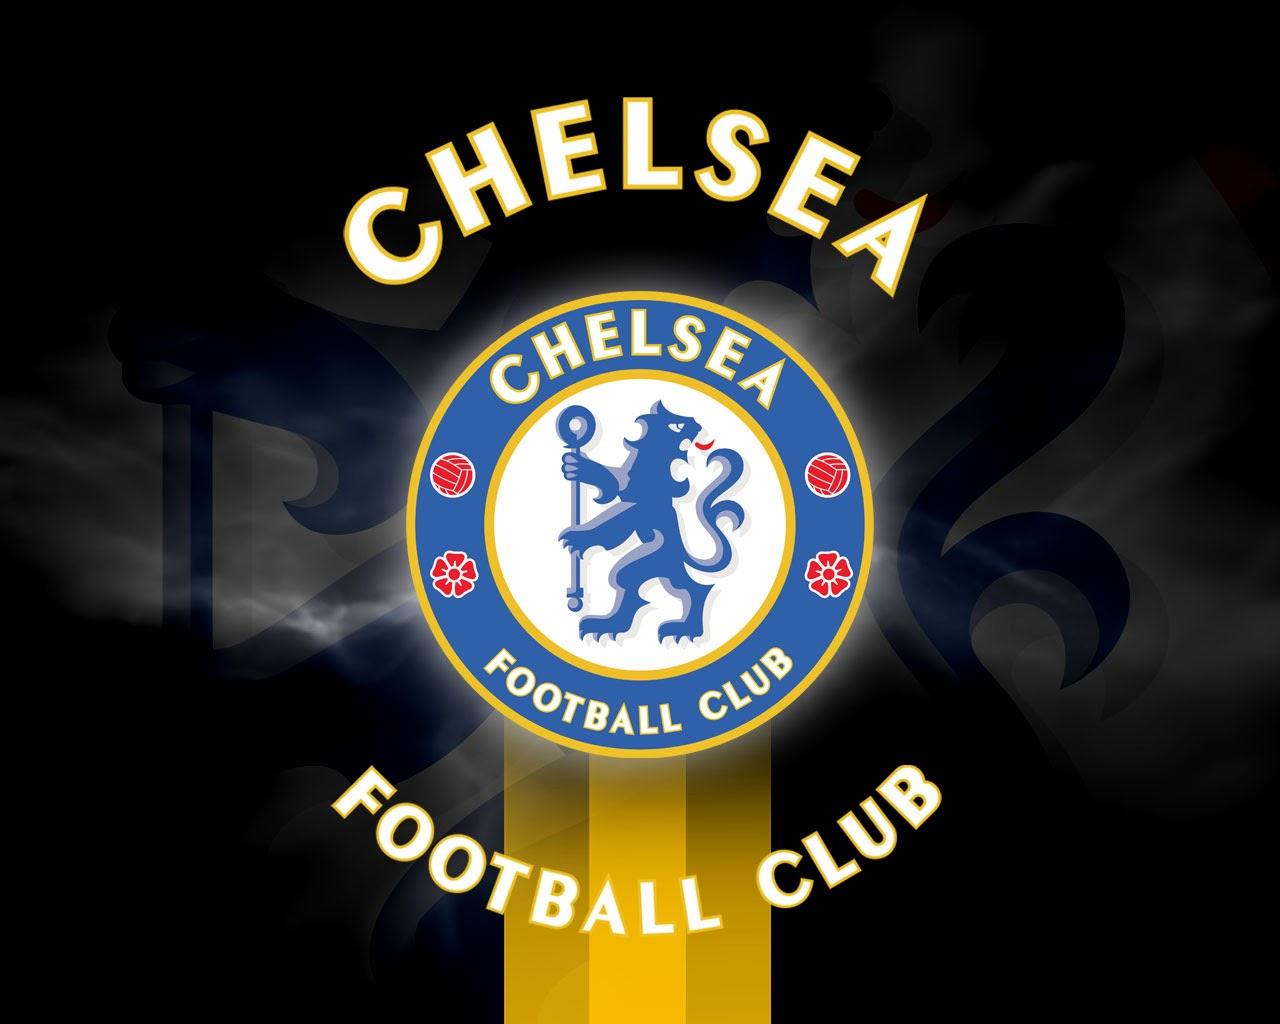 Chelsea: Beautiful Desktop Wallpapers 2014